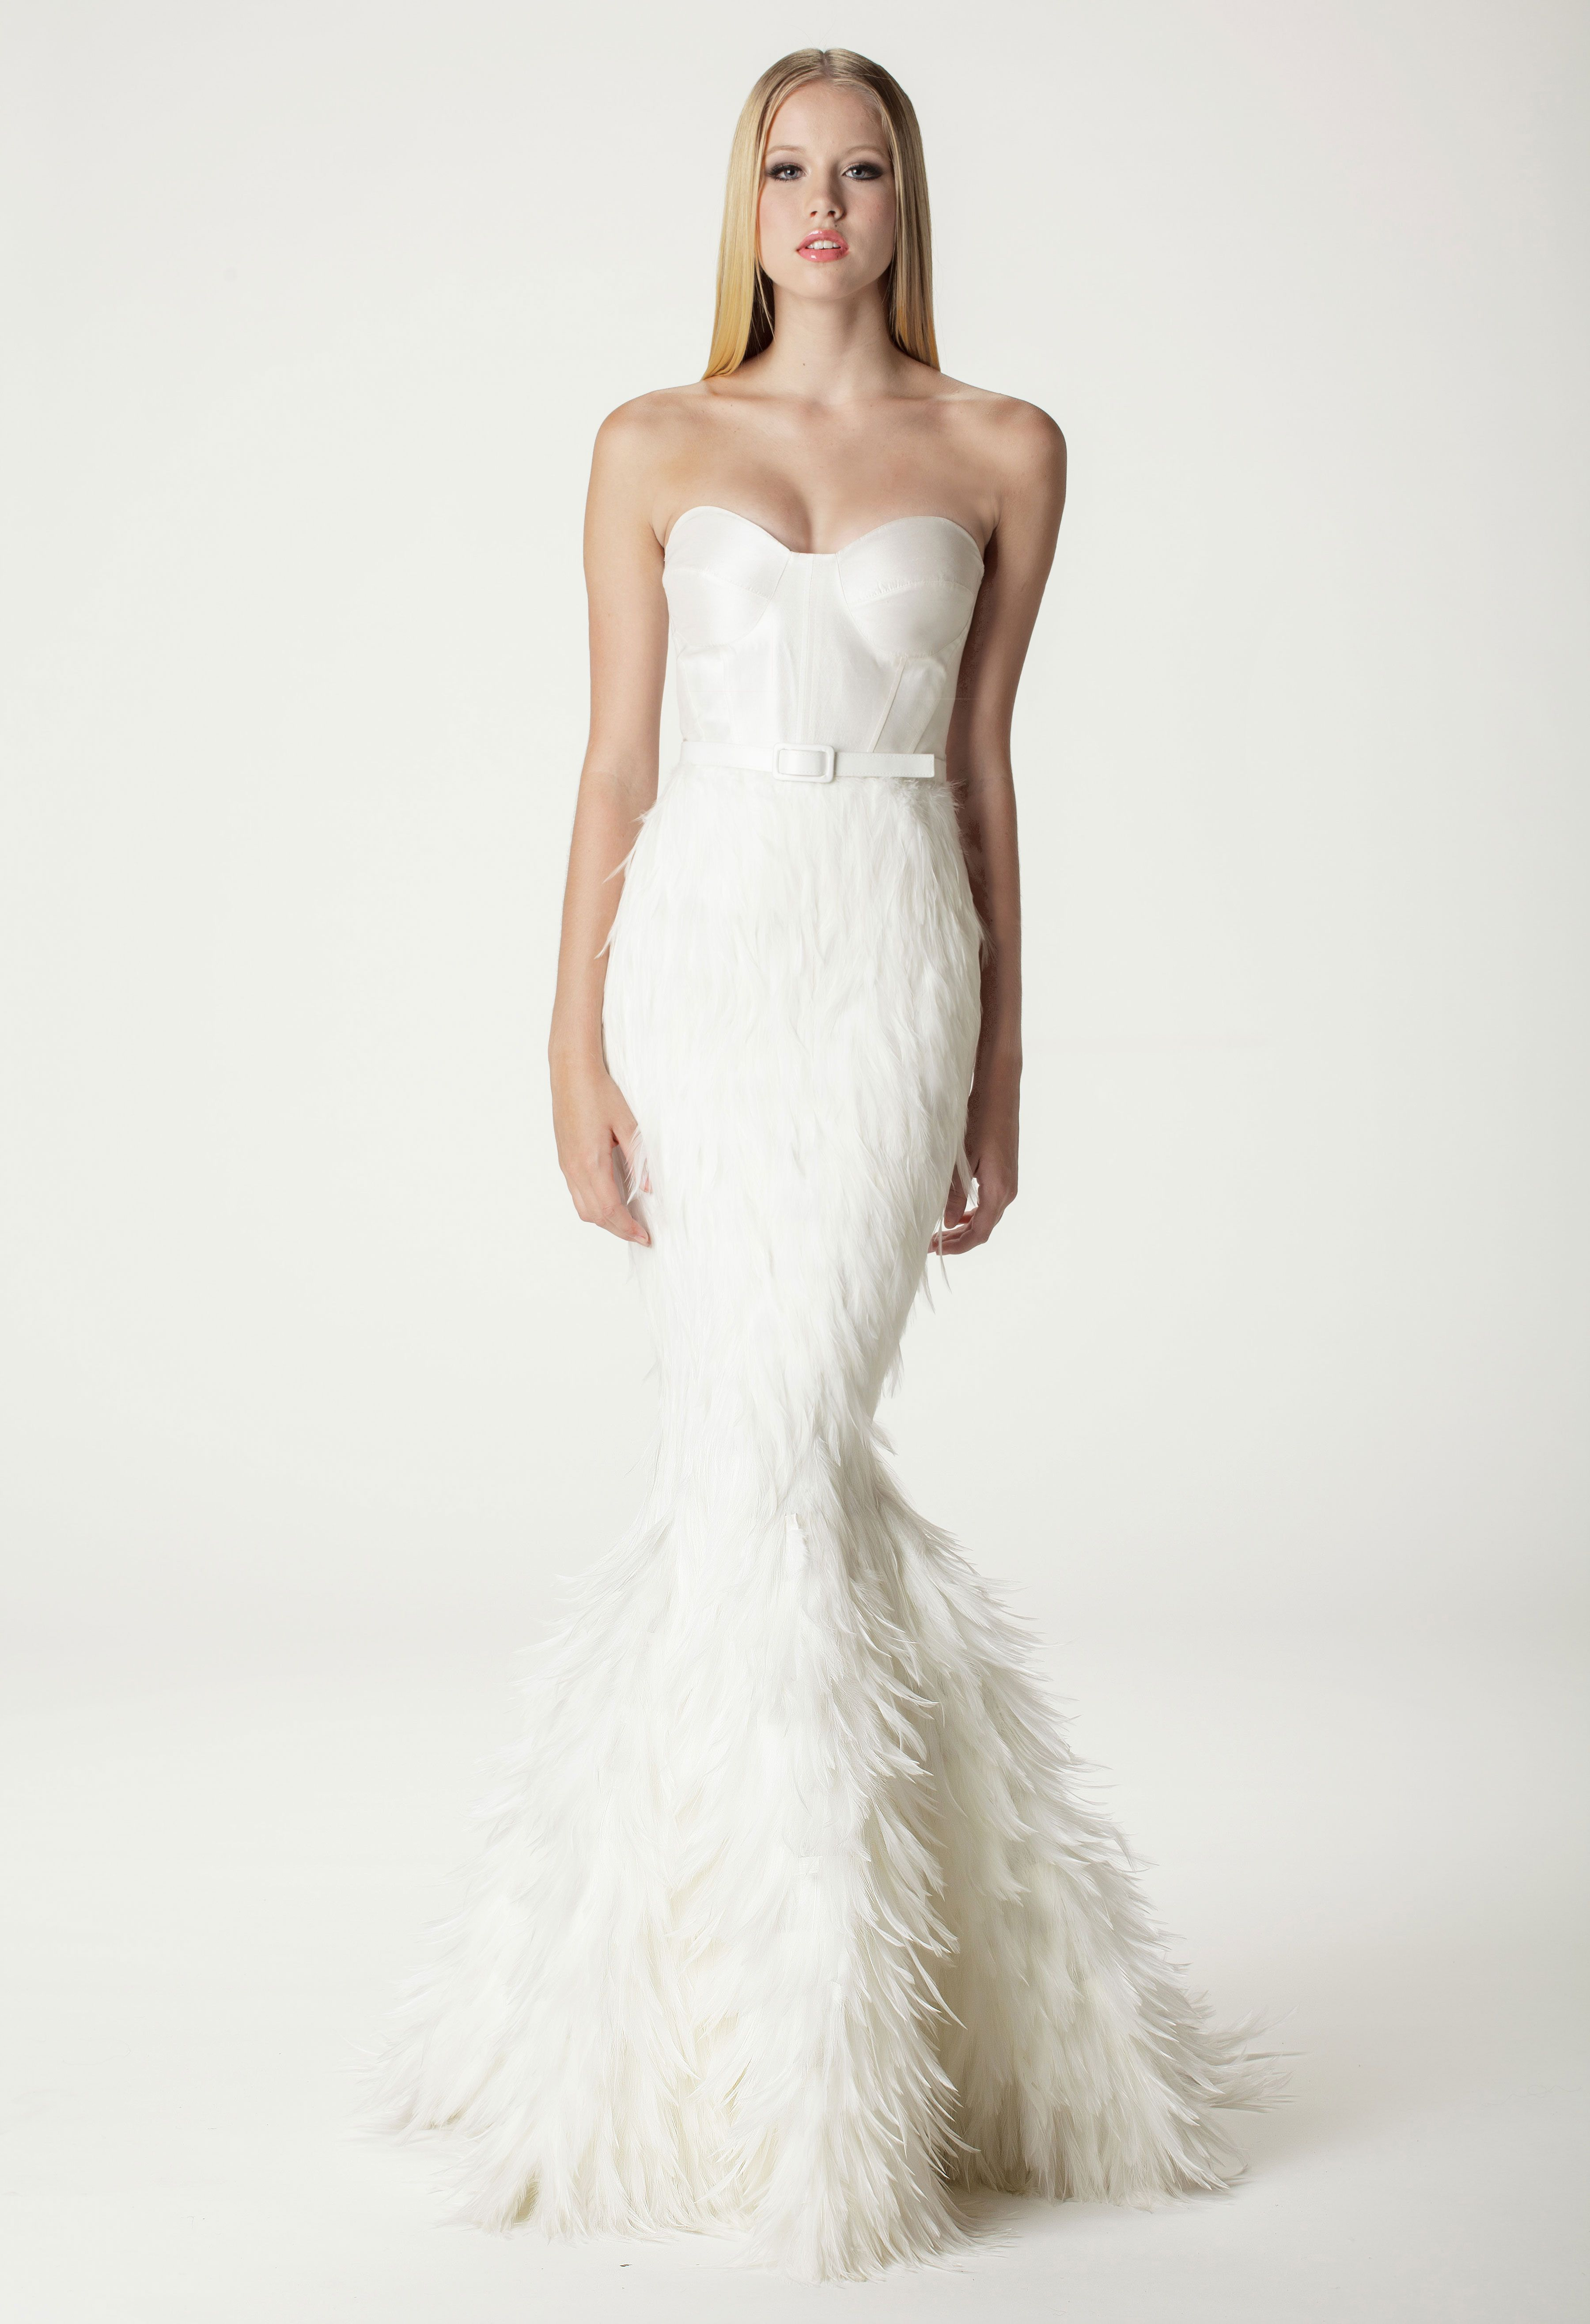 Ideas & Advice | Pinterest | Feather wedding dresses, Wedding dress ...